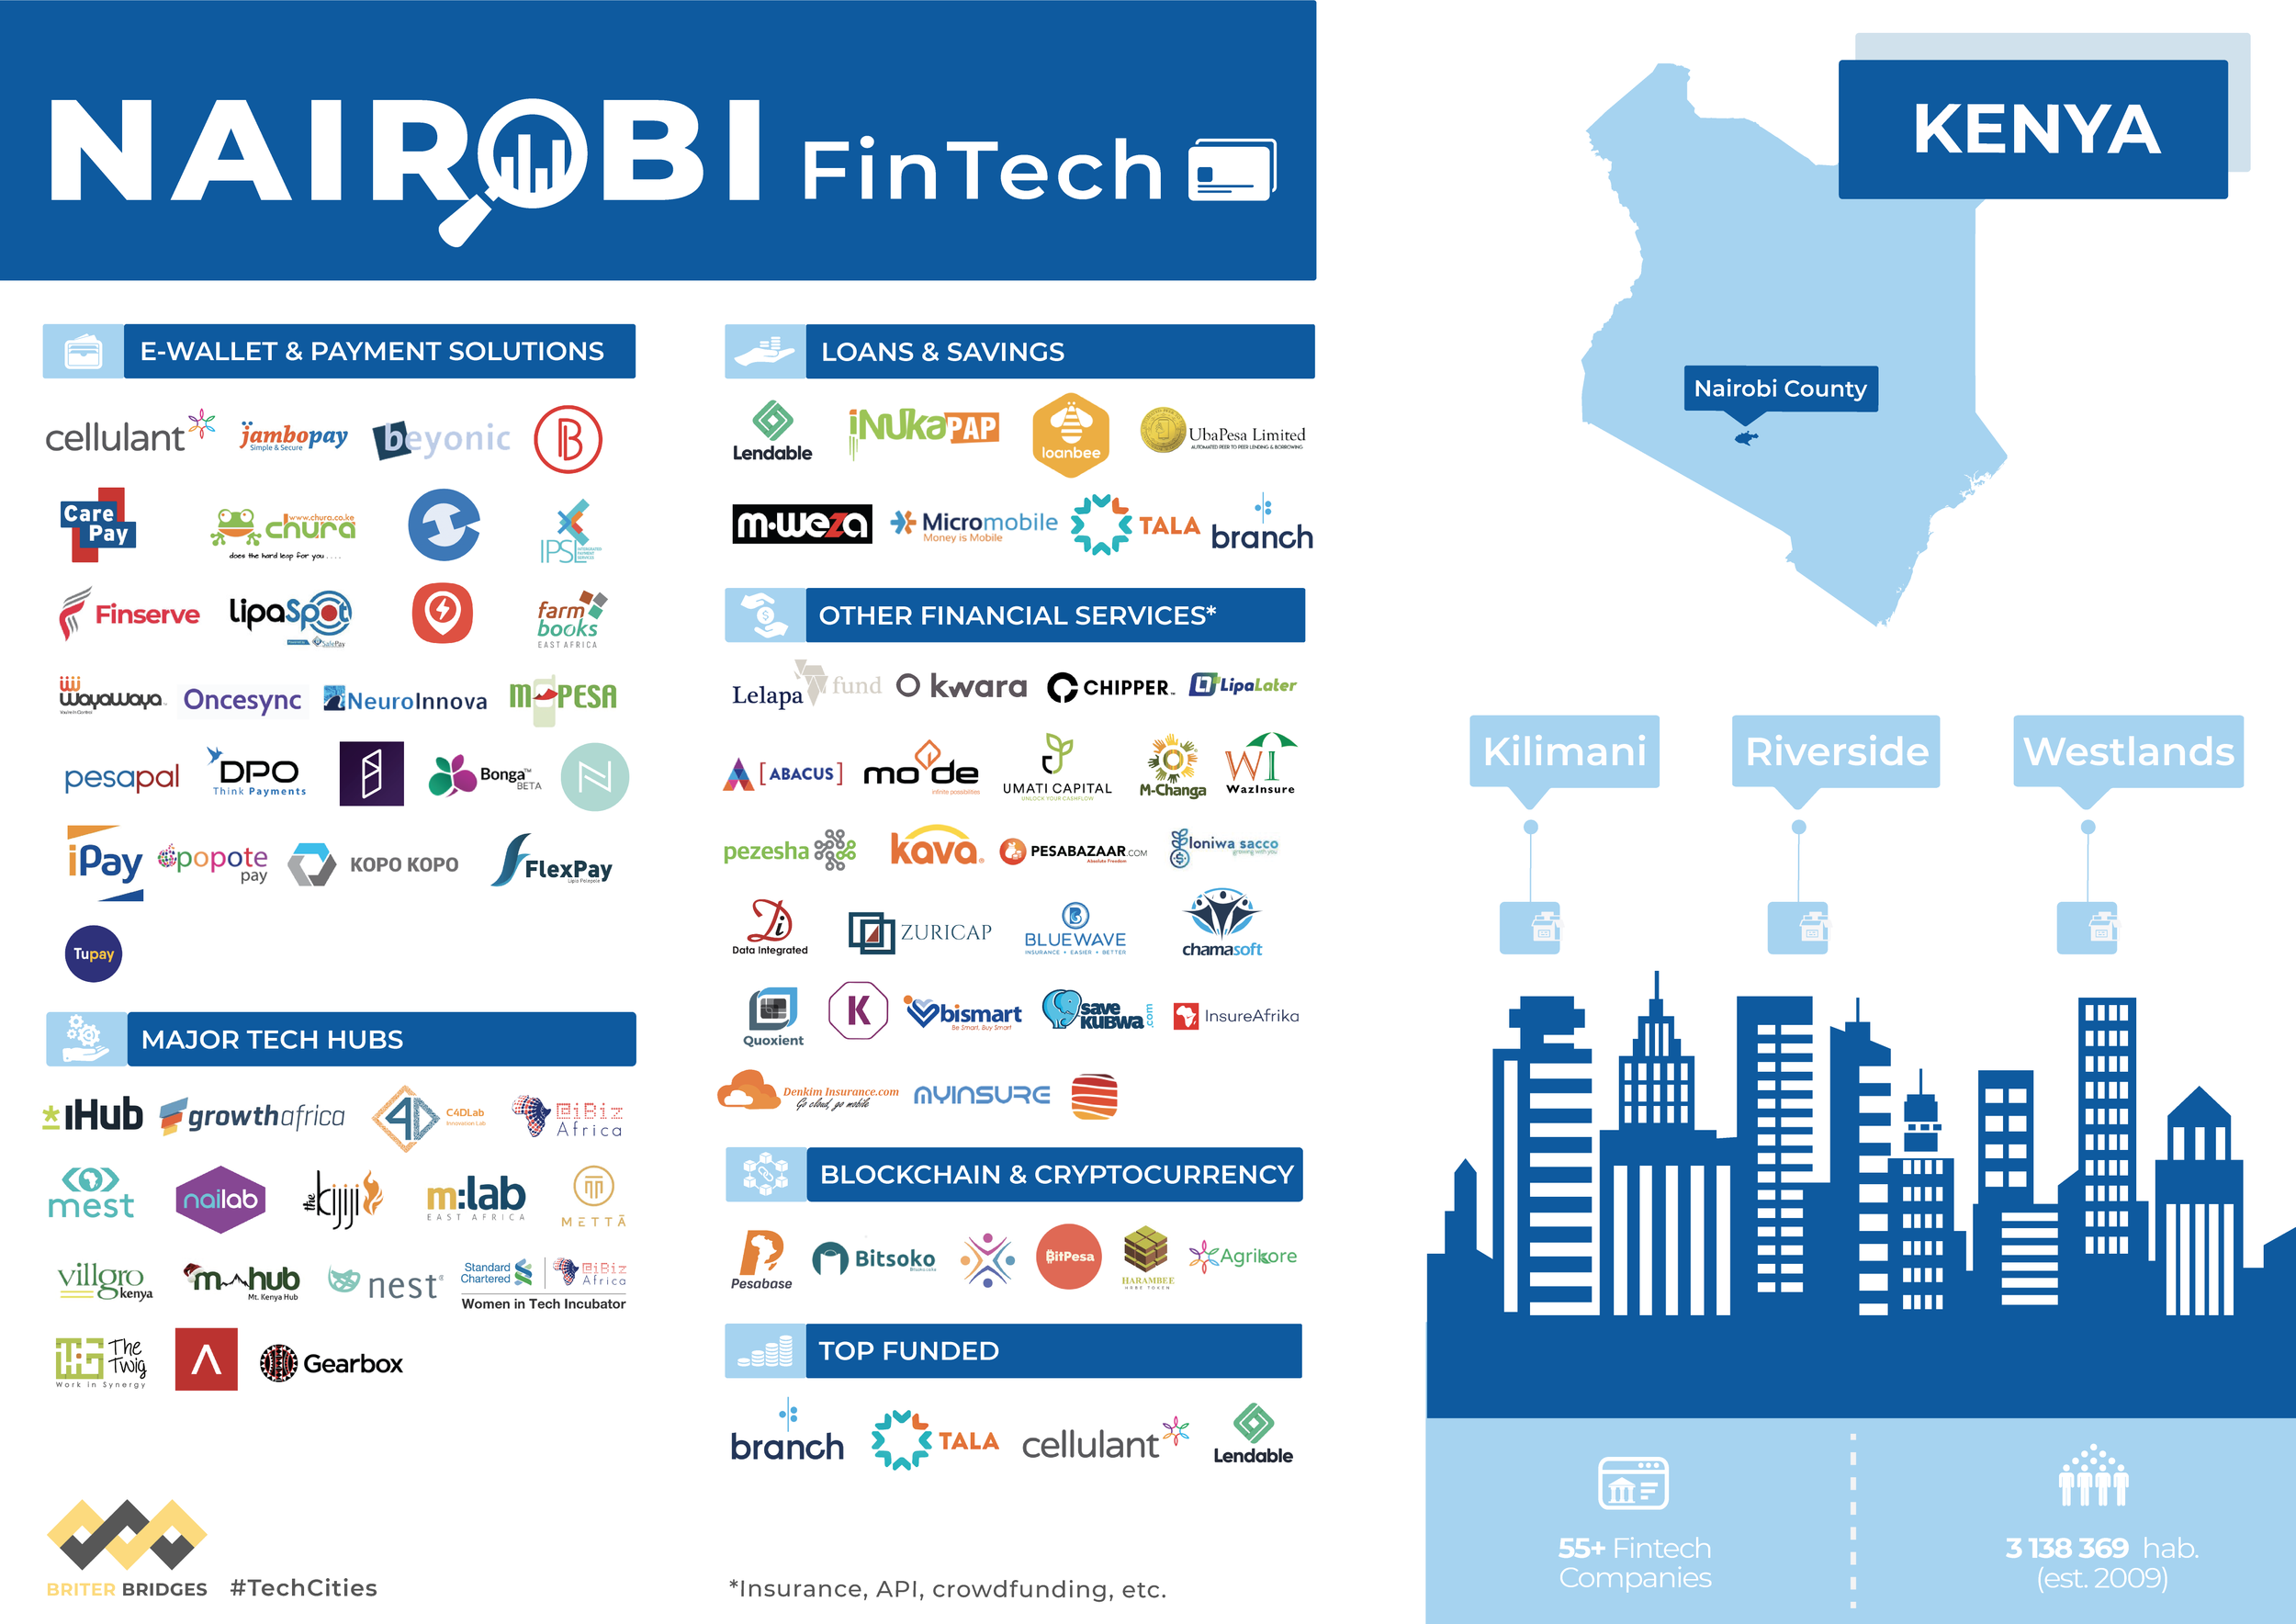 Fintechs in Nairobi, Kenya - Q3 2019